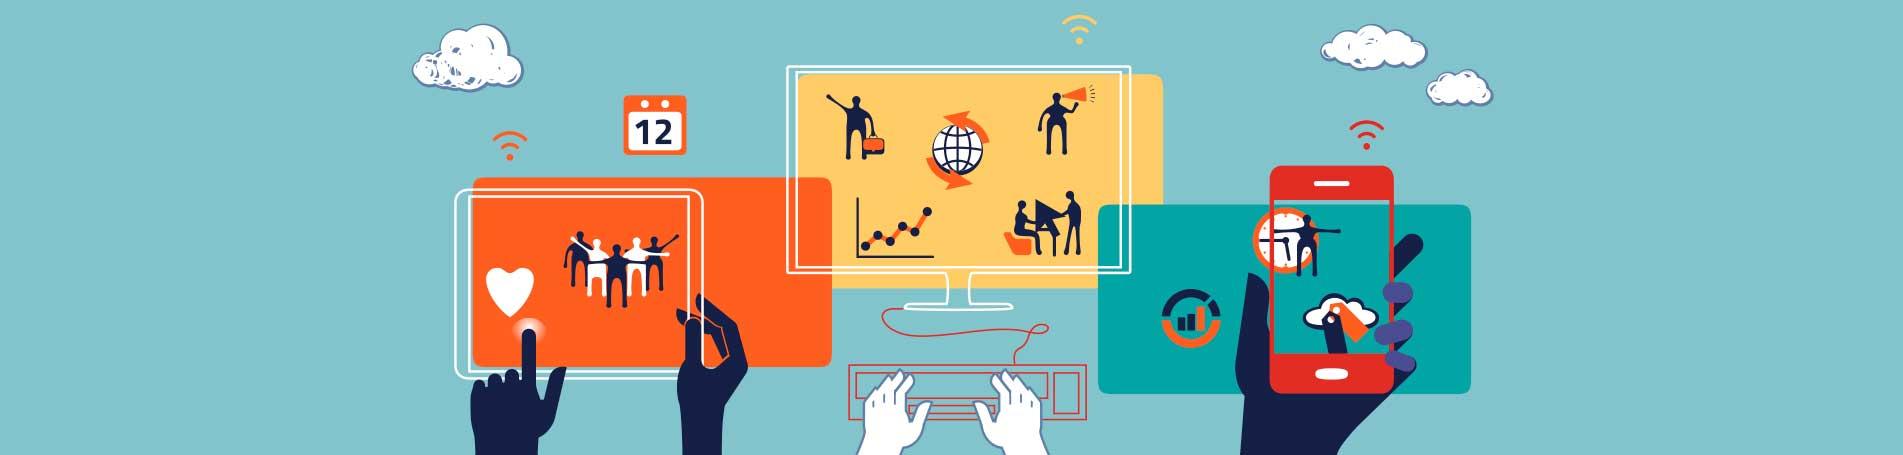 D veloppement digital lifting group - Cabinet de conseil en strategie digitale ...